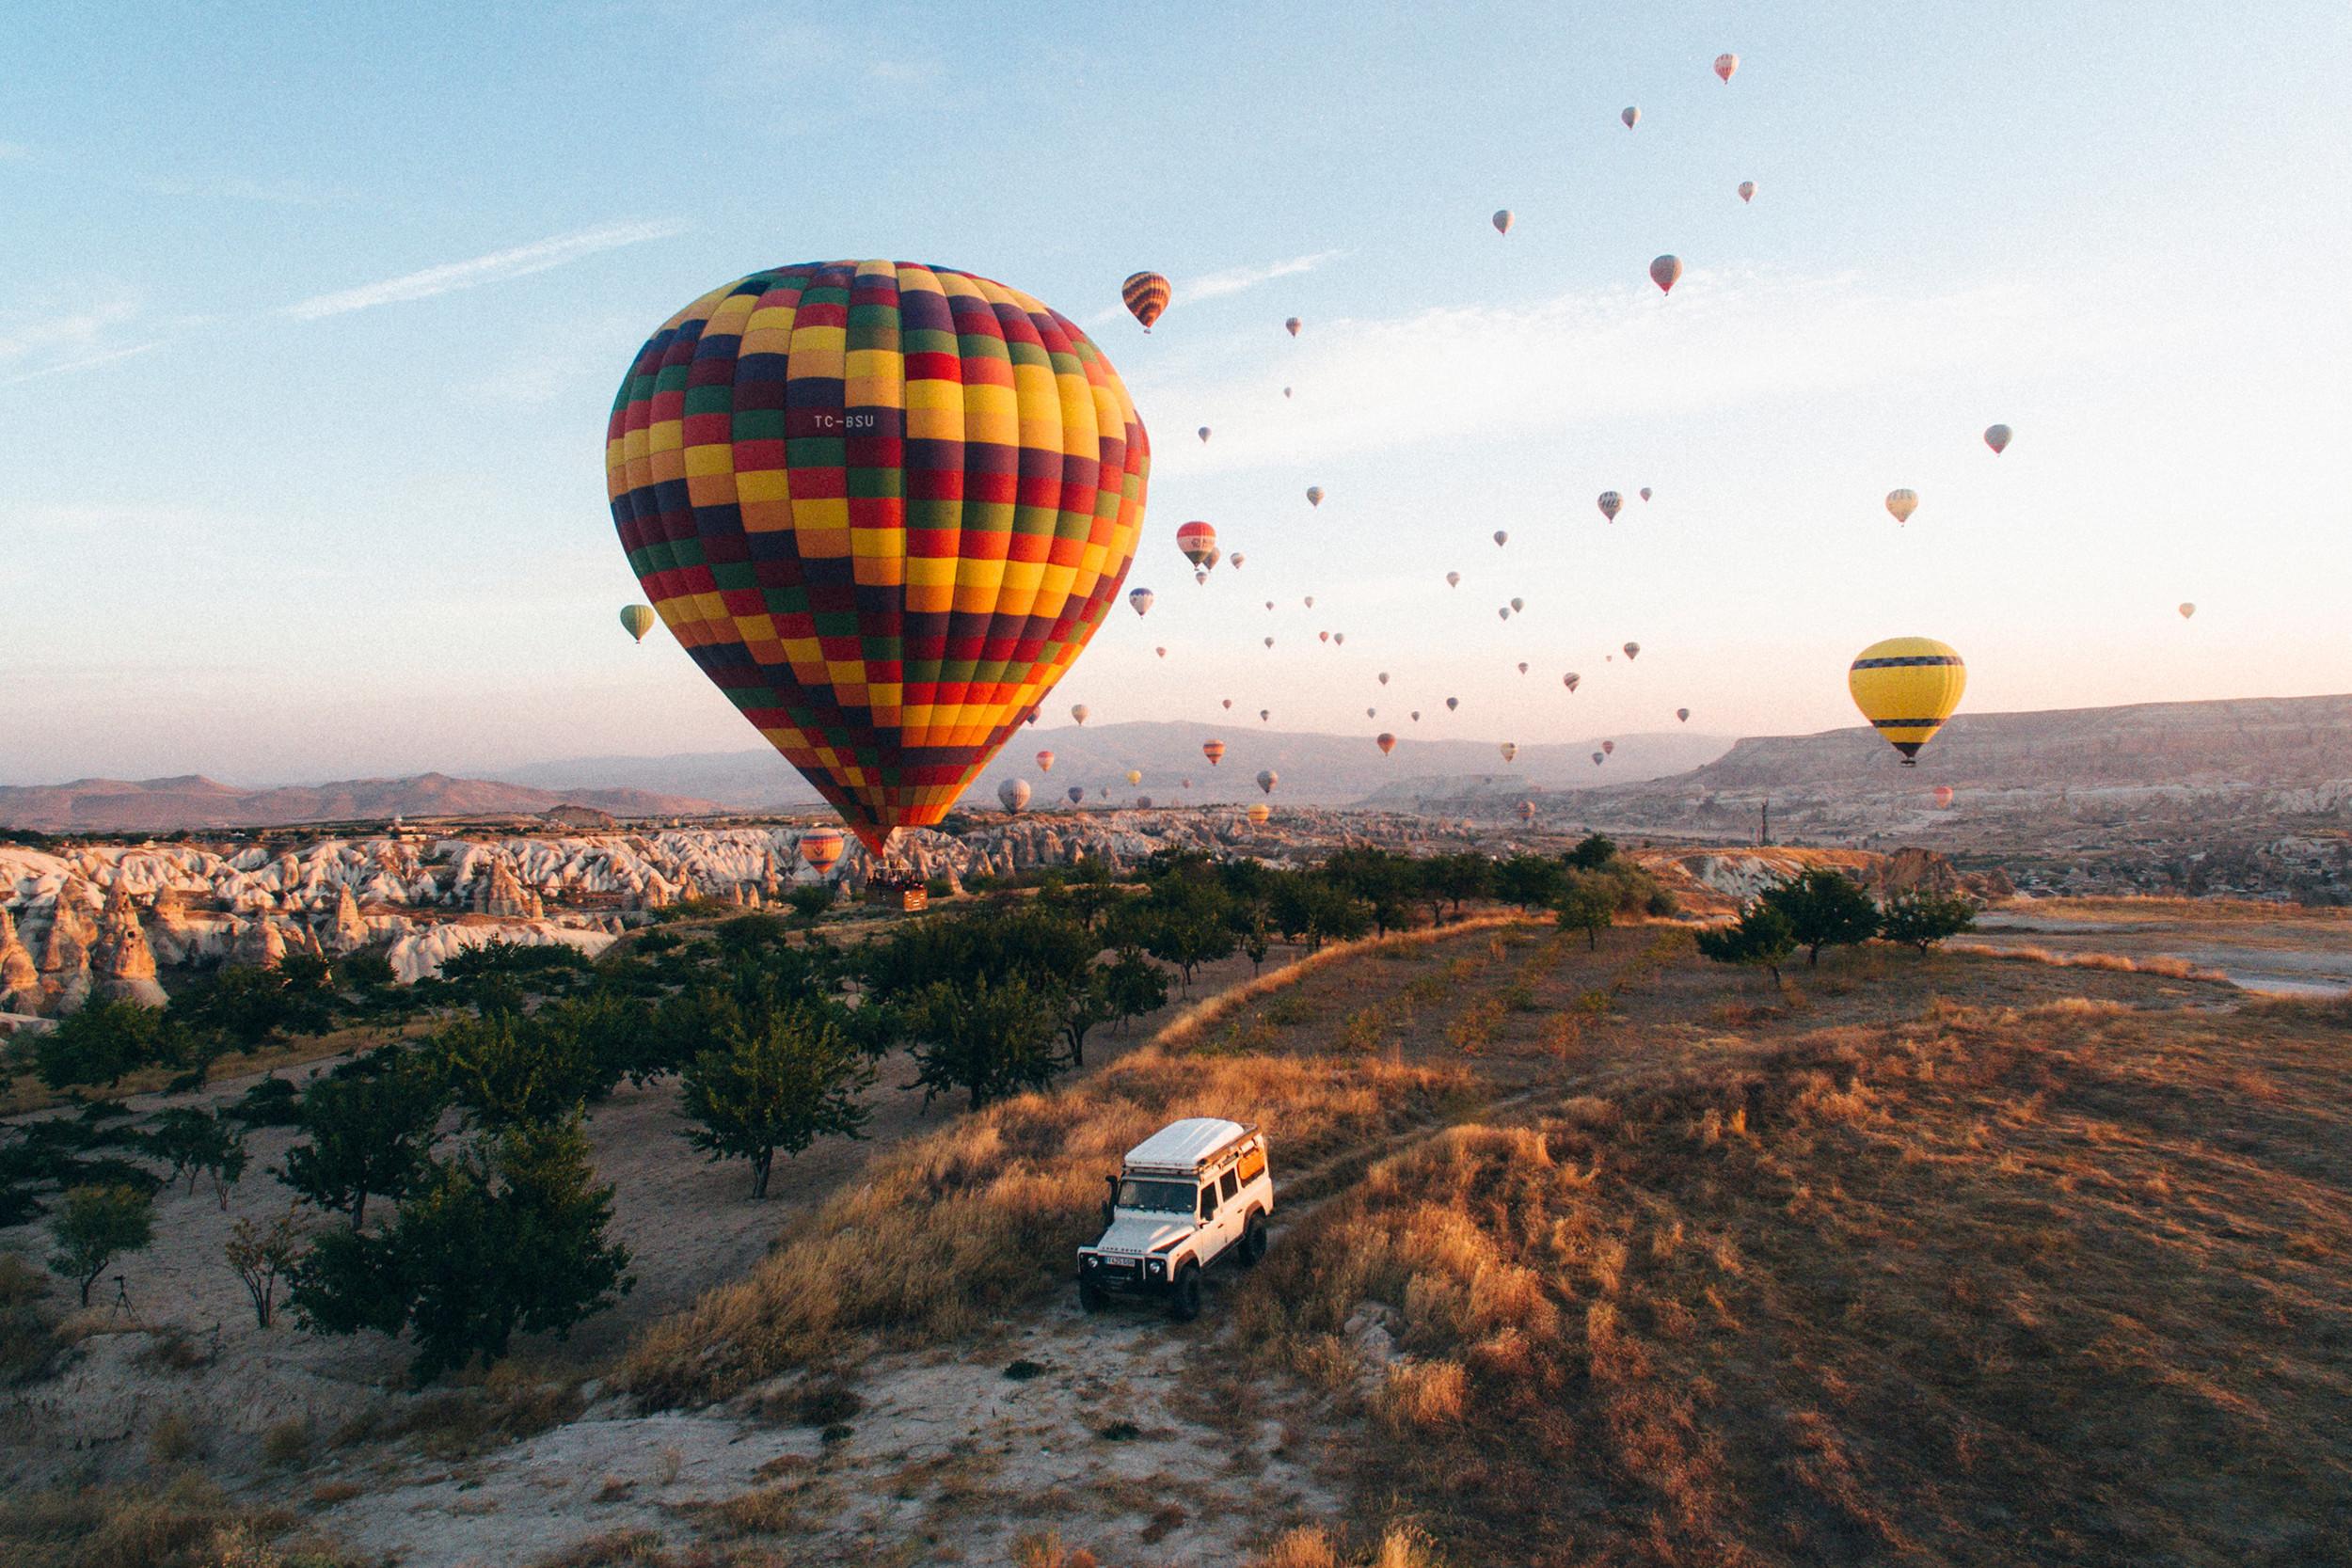 Landrover surrounded by balloons, Cappadocia